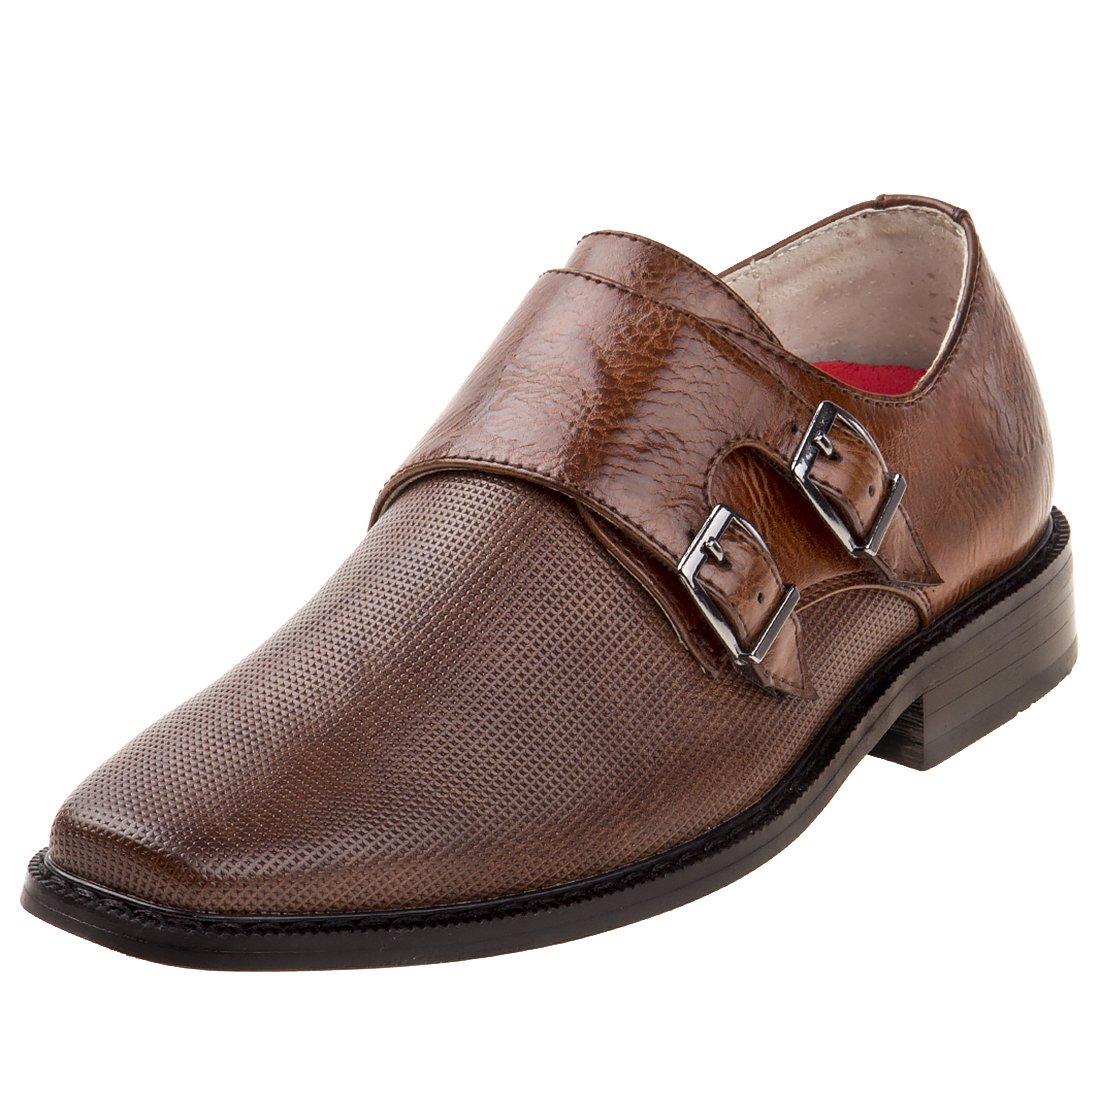 Joseph Allen Boy's Dressy Textured Shoe with Double Buckle, Brown, 7 M US Big Kid'